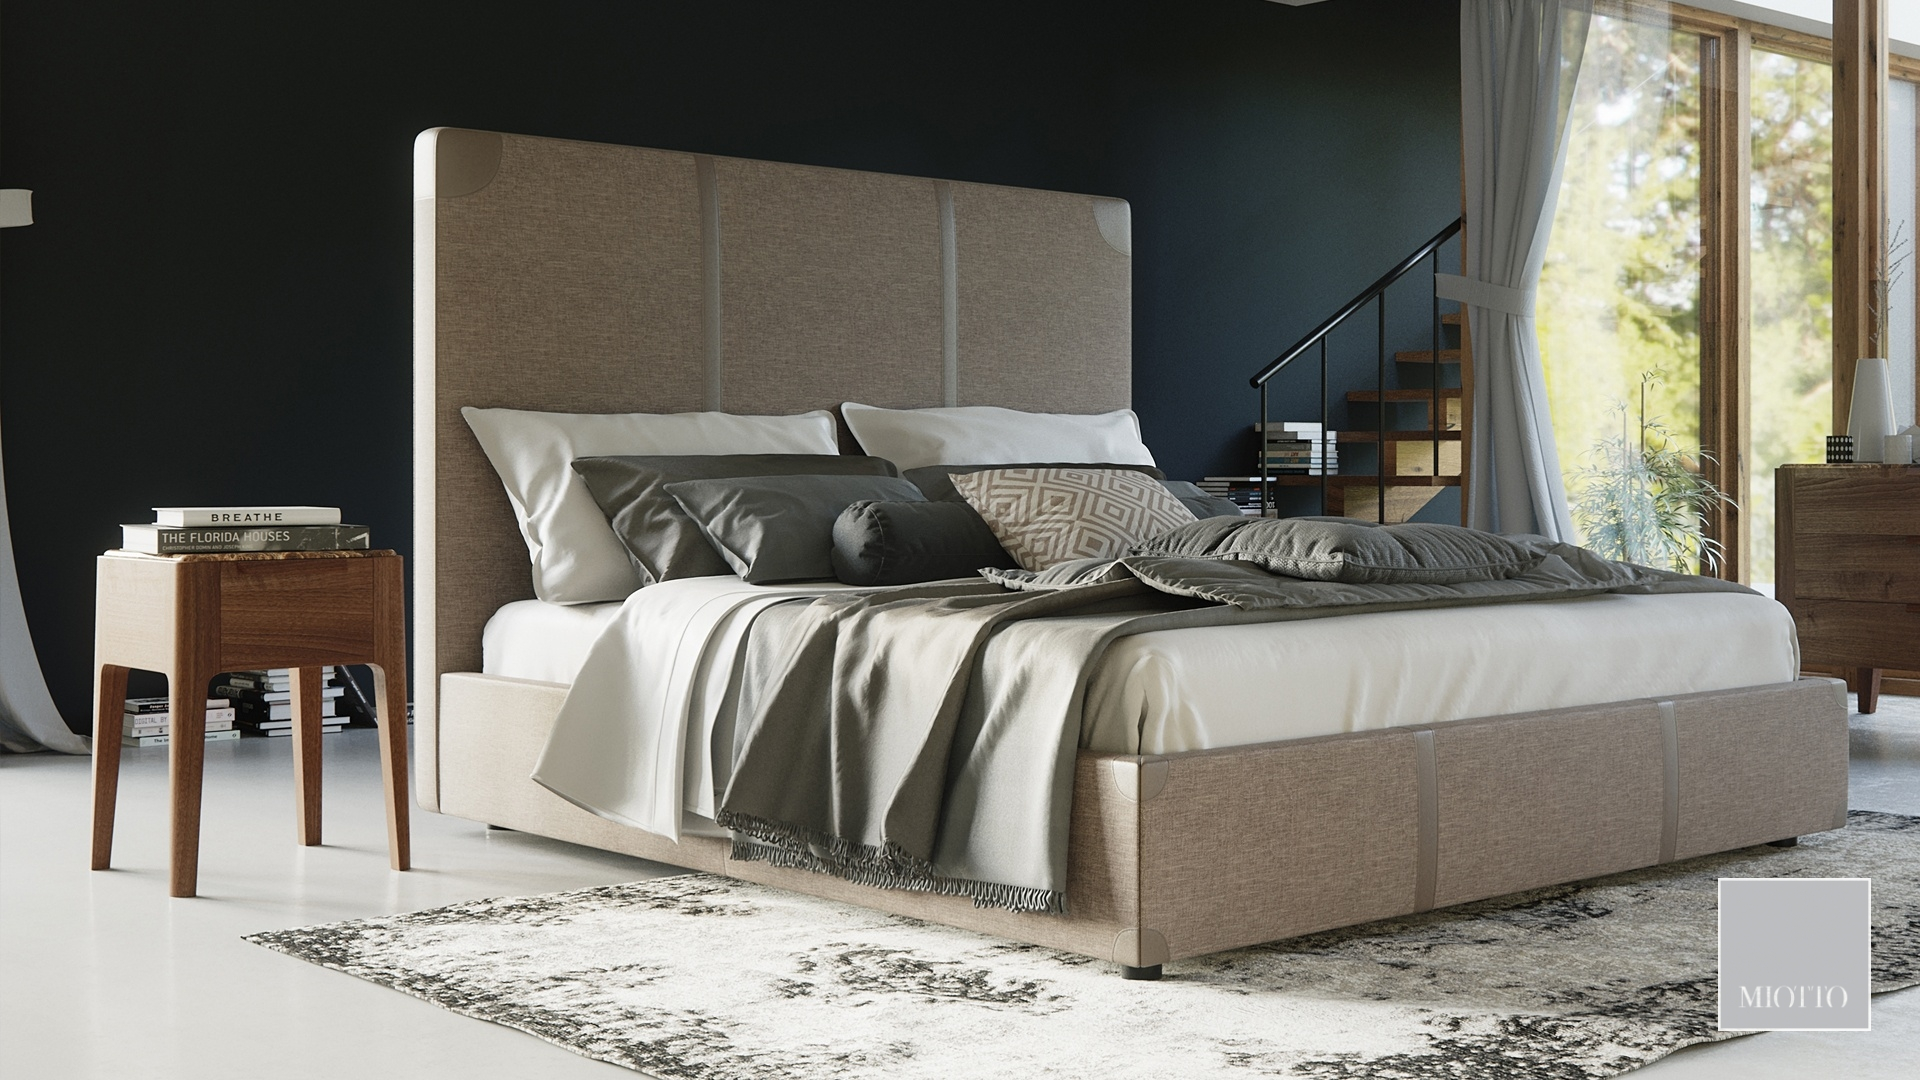 miotto_marano bedside, bolgheri bed